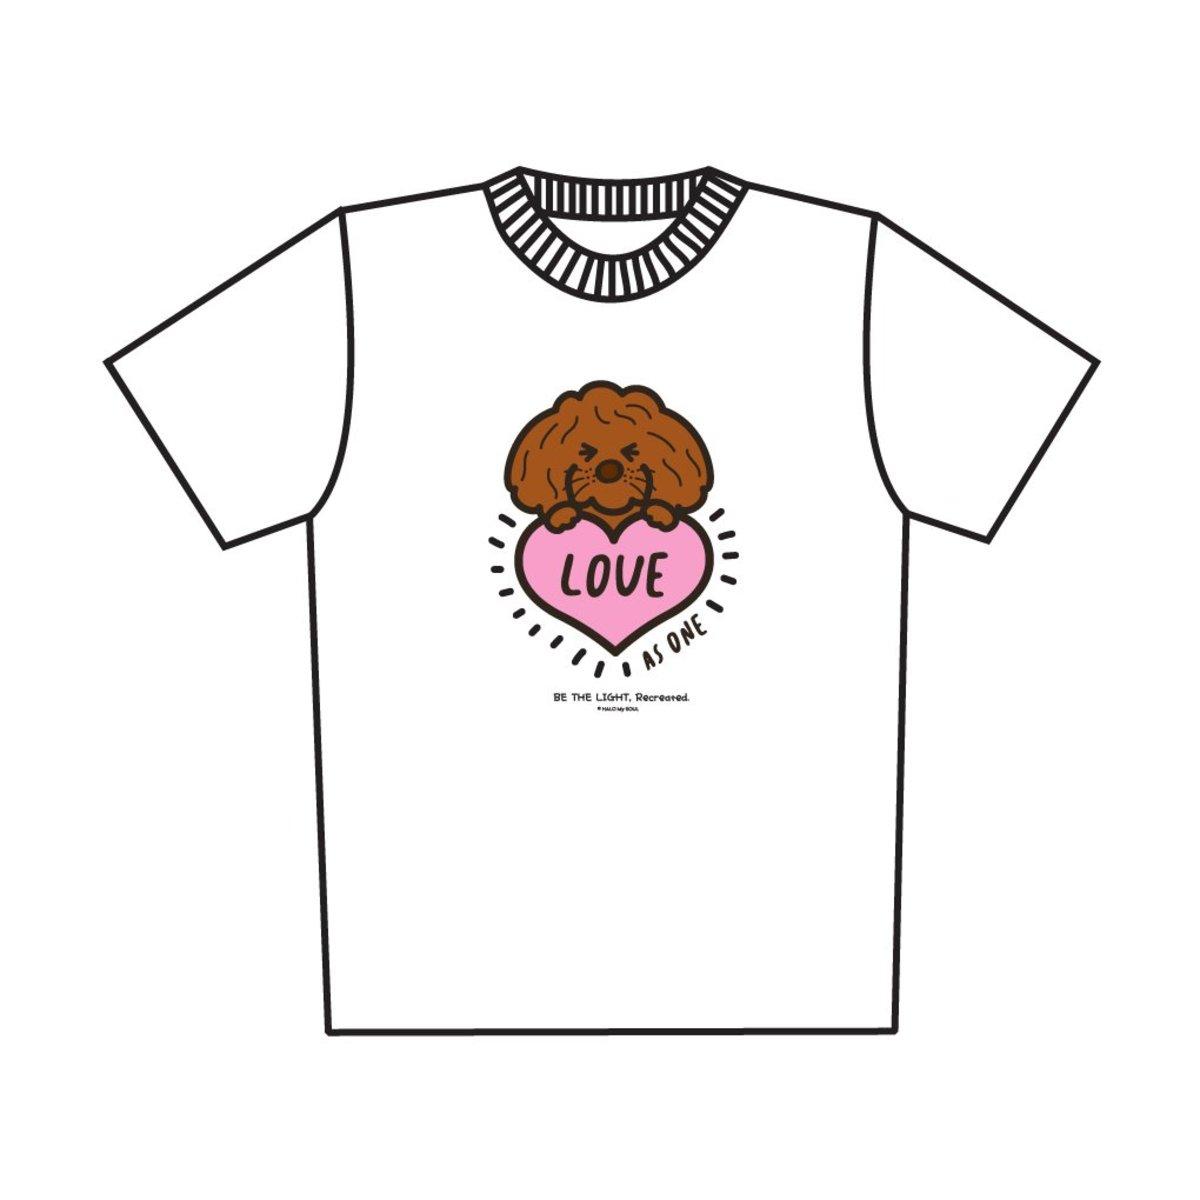 SPCA x HALO My SOUL T-Shirt